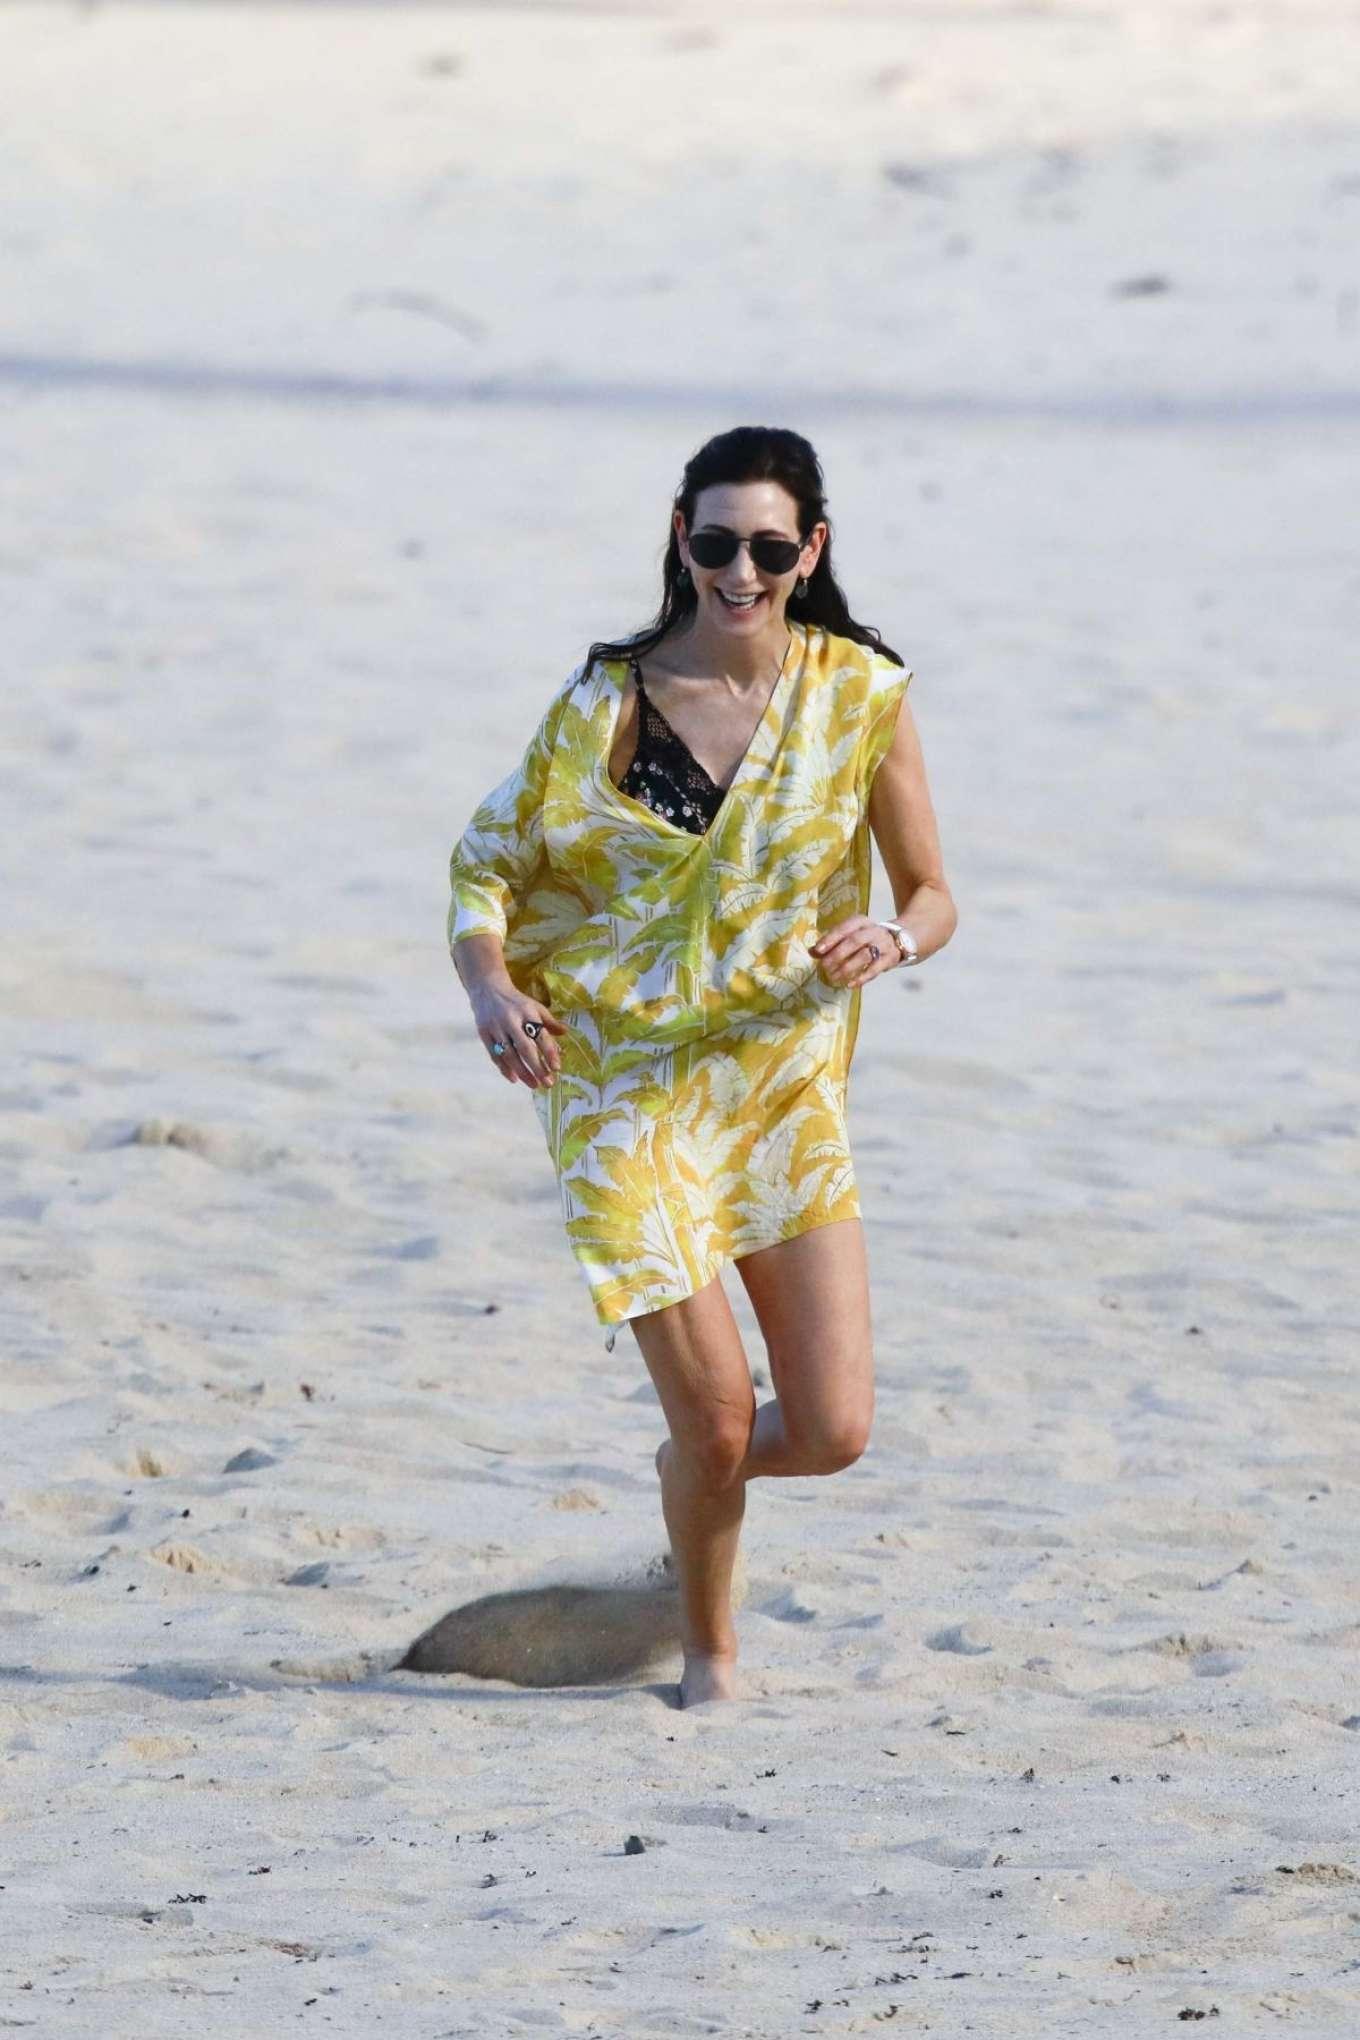 Photos Francesca Brambilla Livia Canalis nude (25 photo), Pussy, Hot, Boobs, cleavage 2019